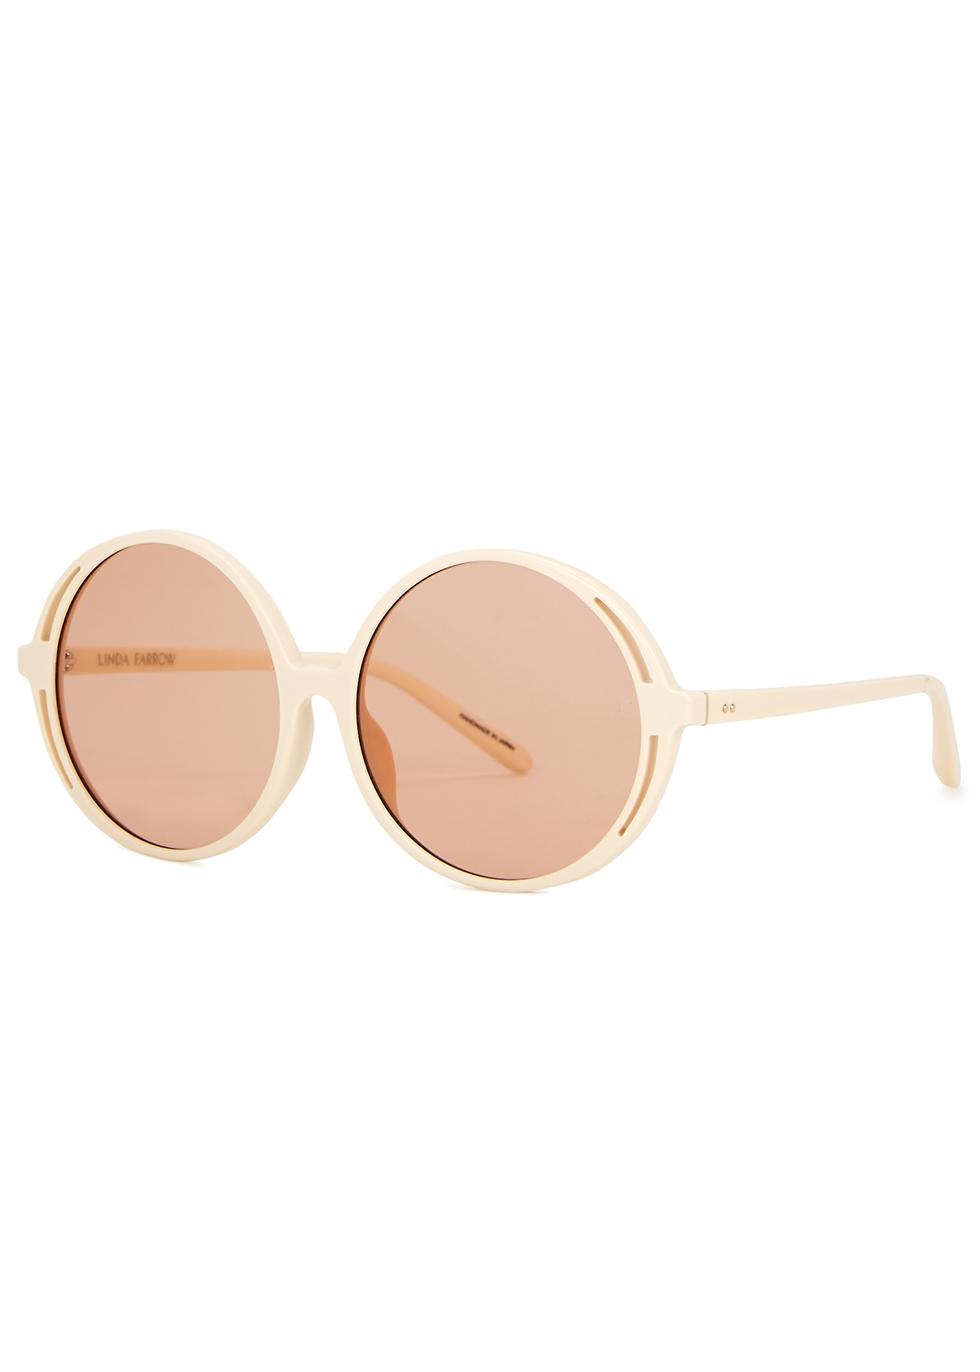 Bianca round-frame sunglasses